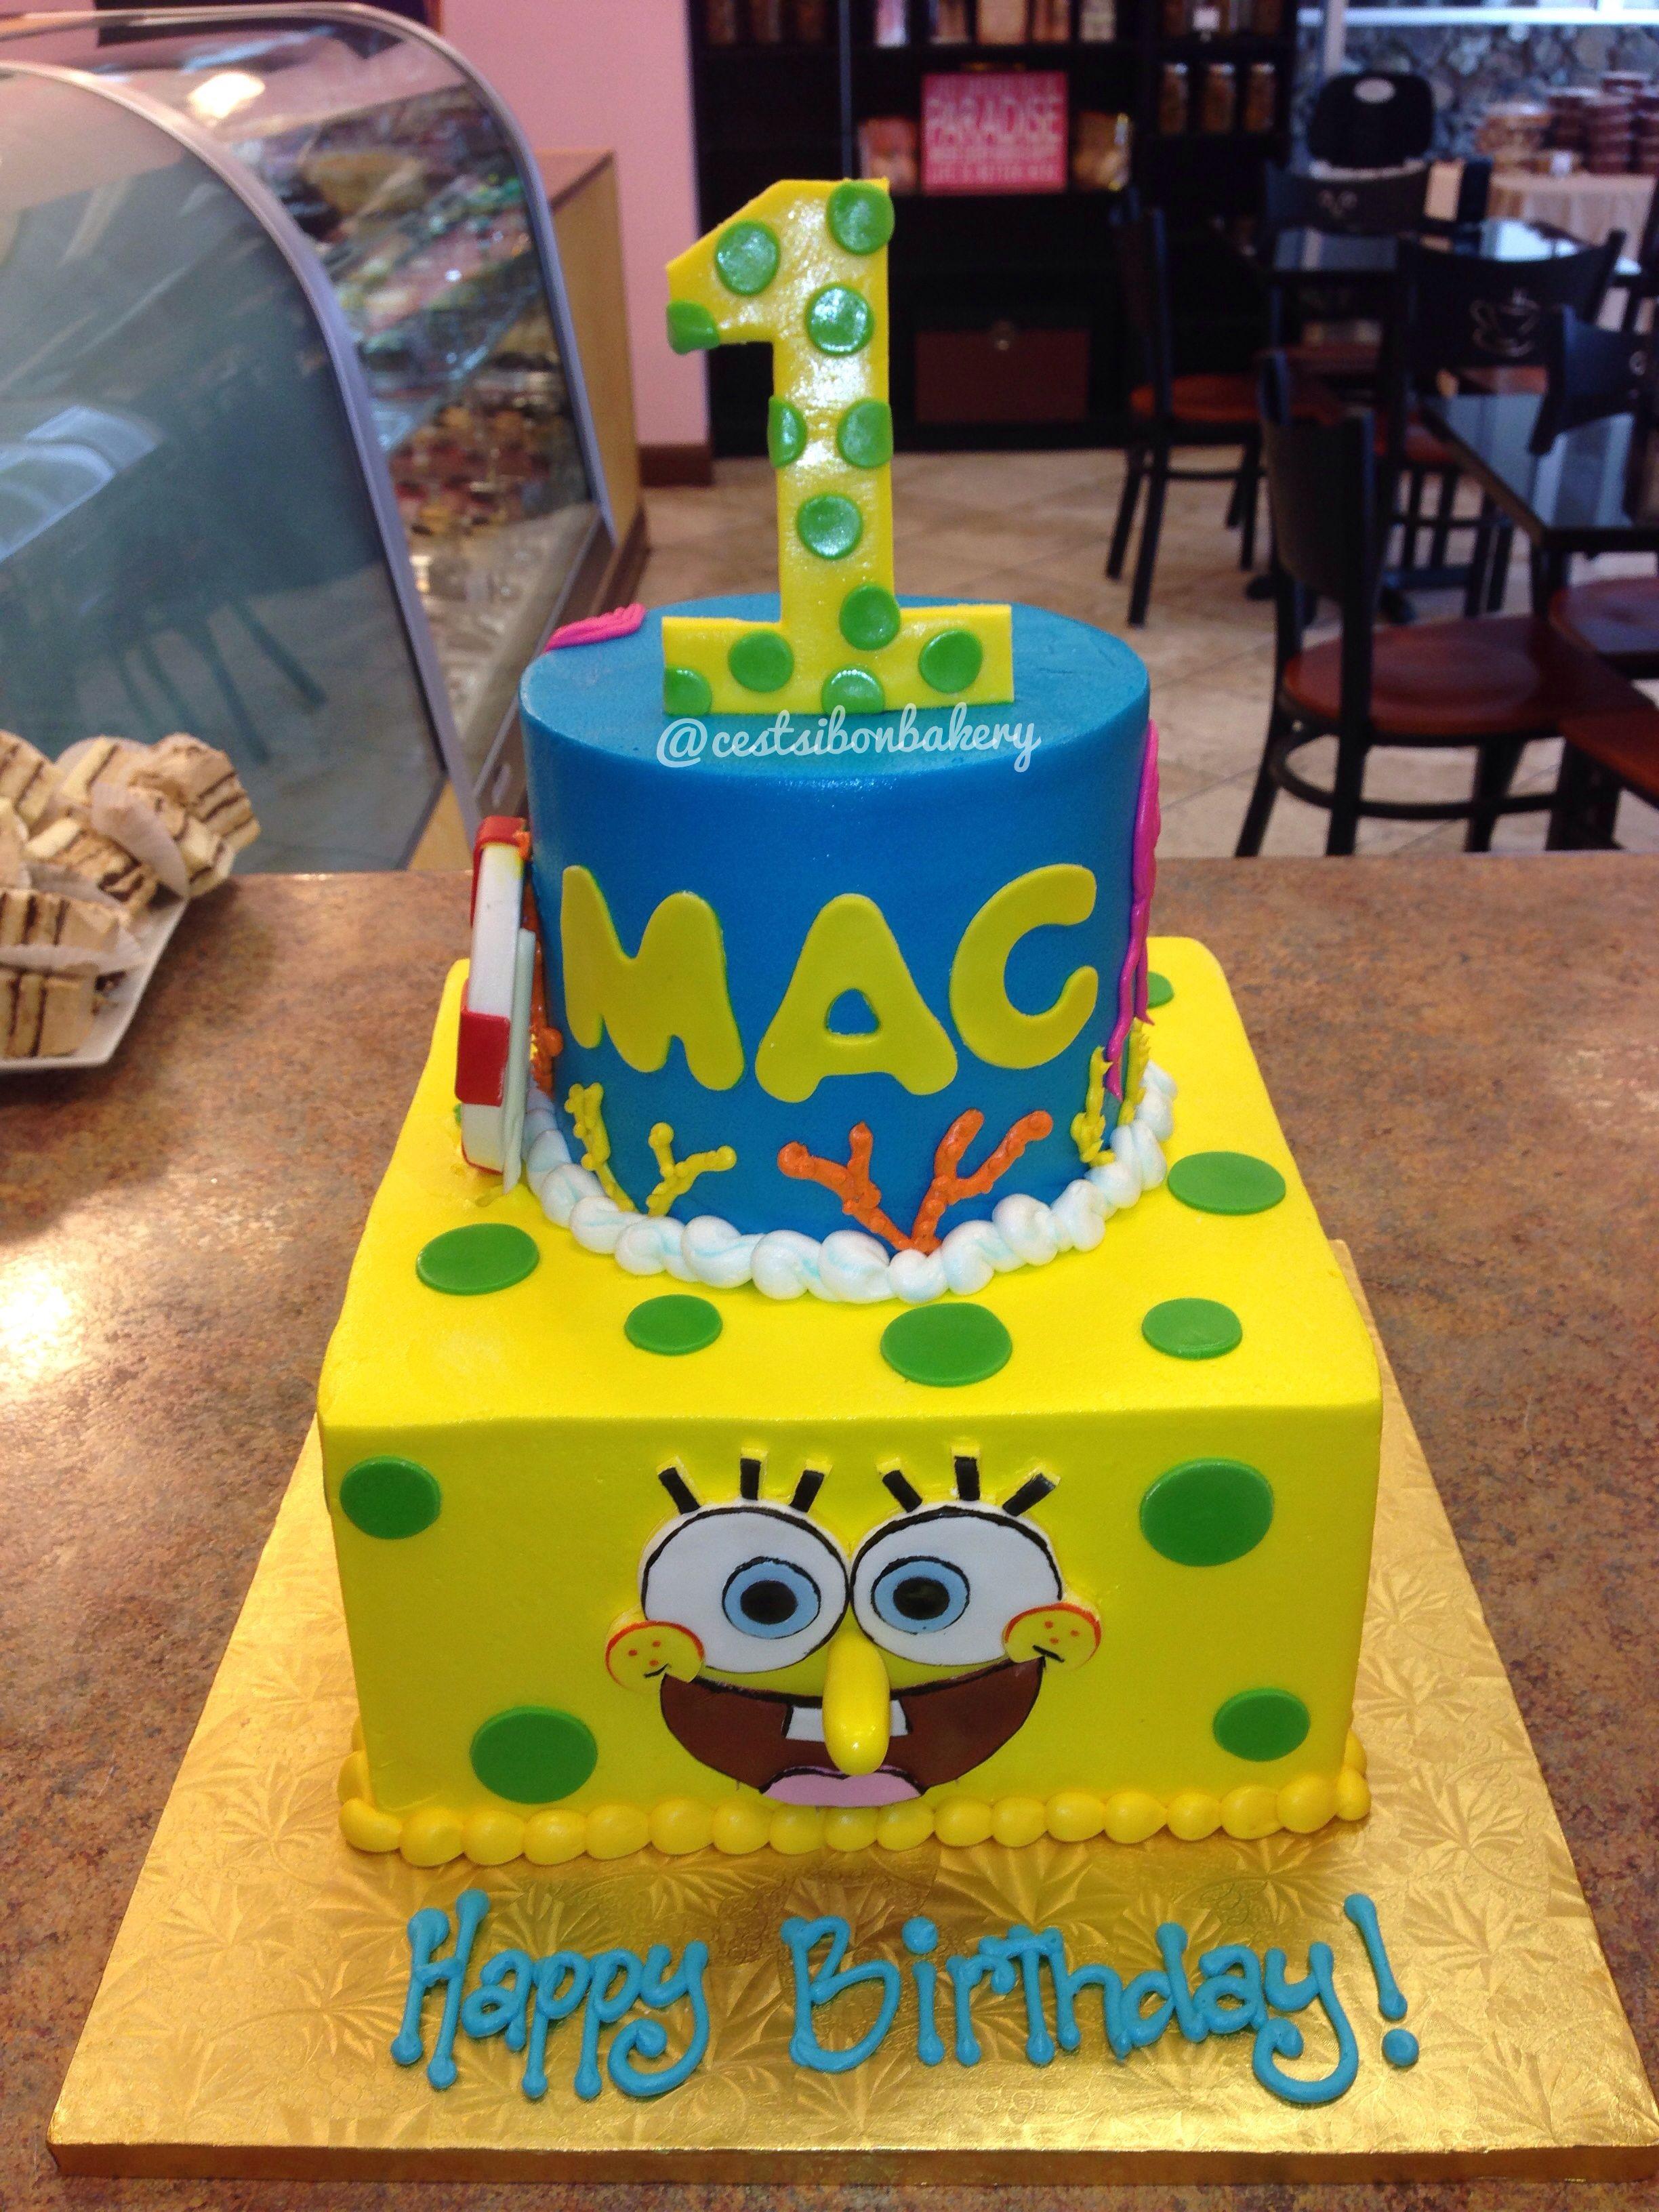 Wondrous Spongebob Cake Spongebob Cake Spongebob Birthday Birthday Funny Birthday Cards Online Drosicarndamsfinfo